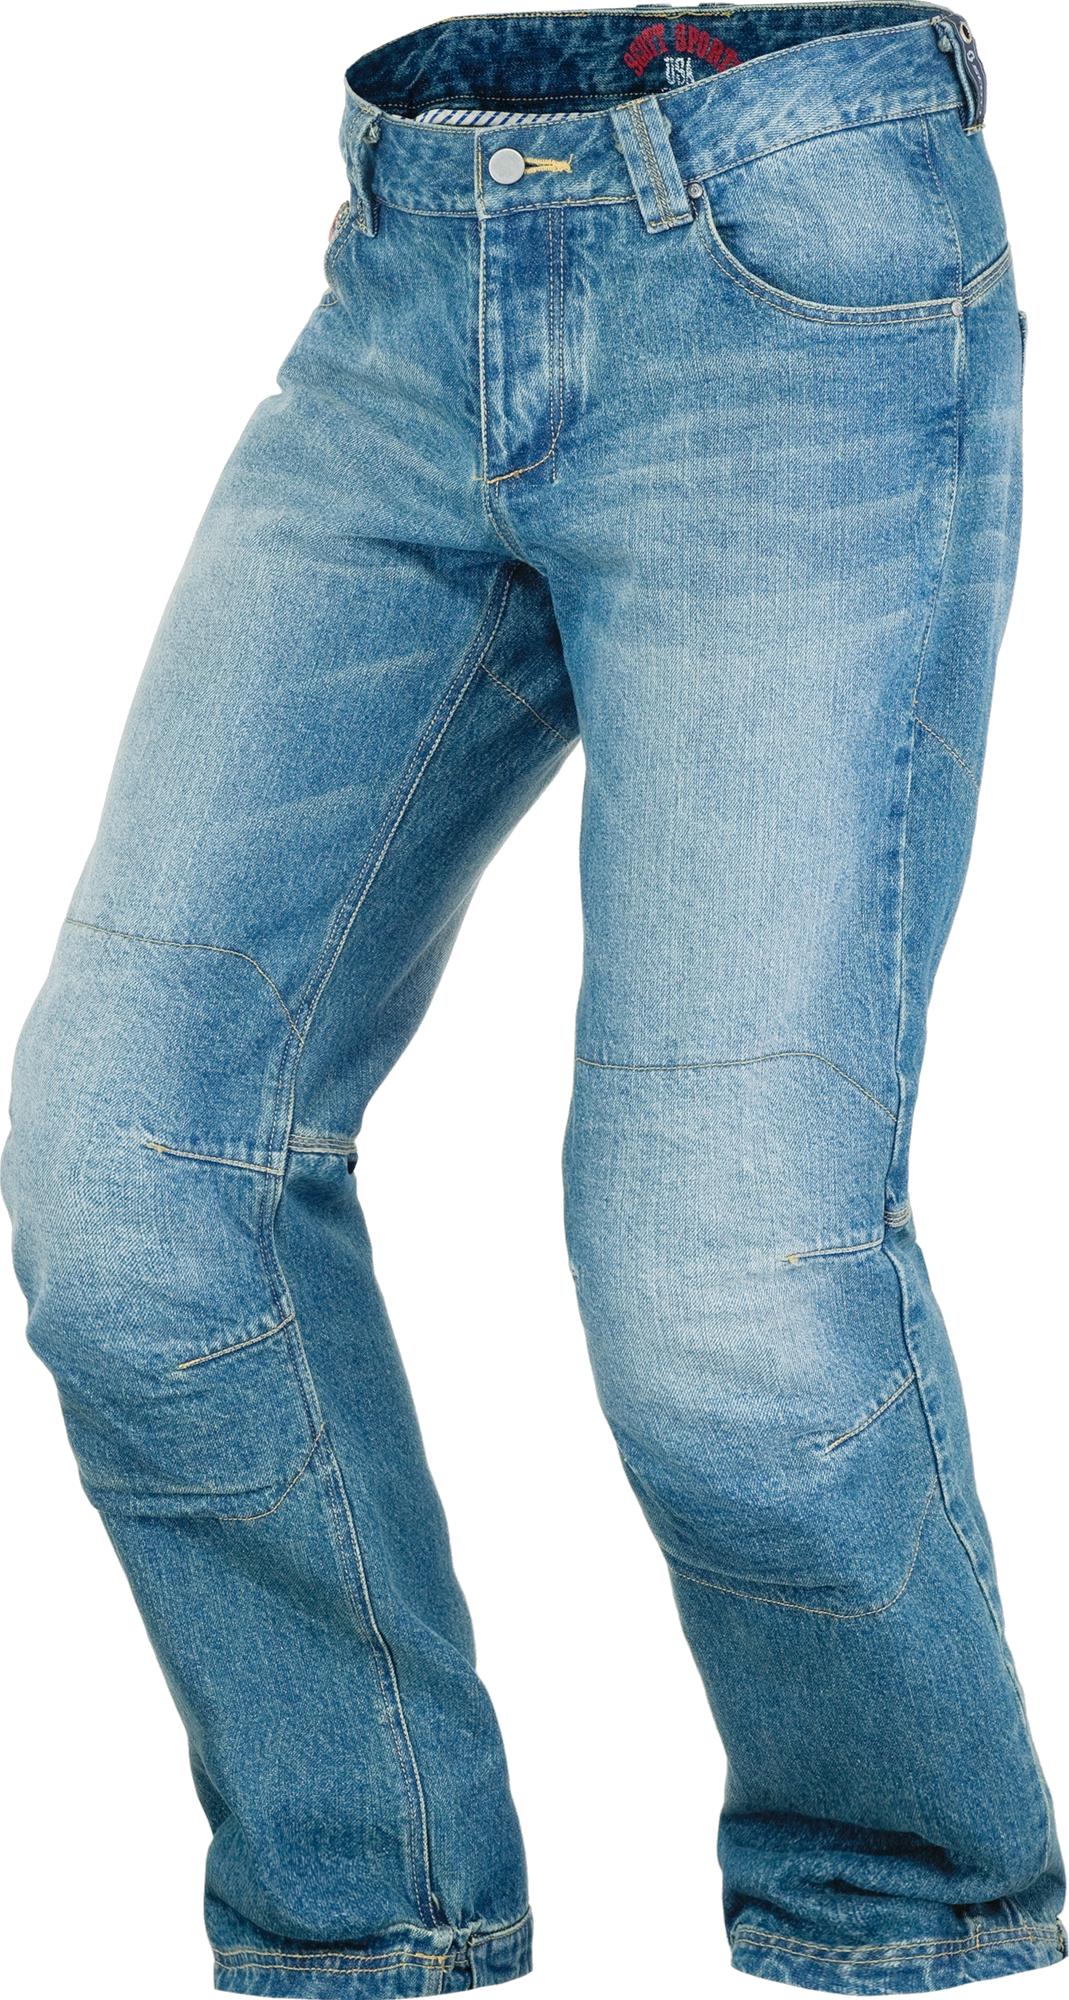 PNG HD Pants - 122703